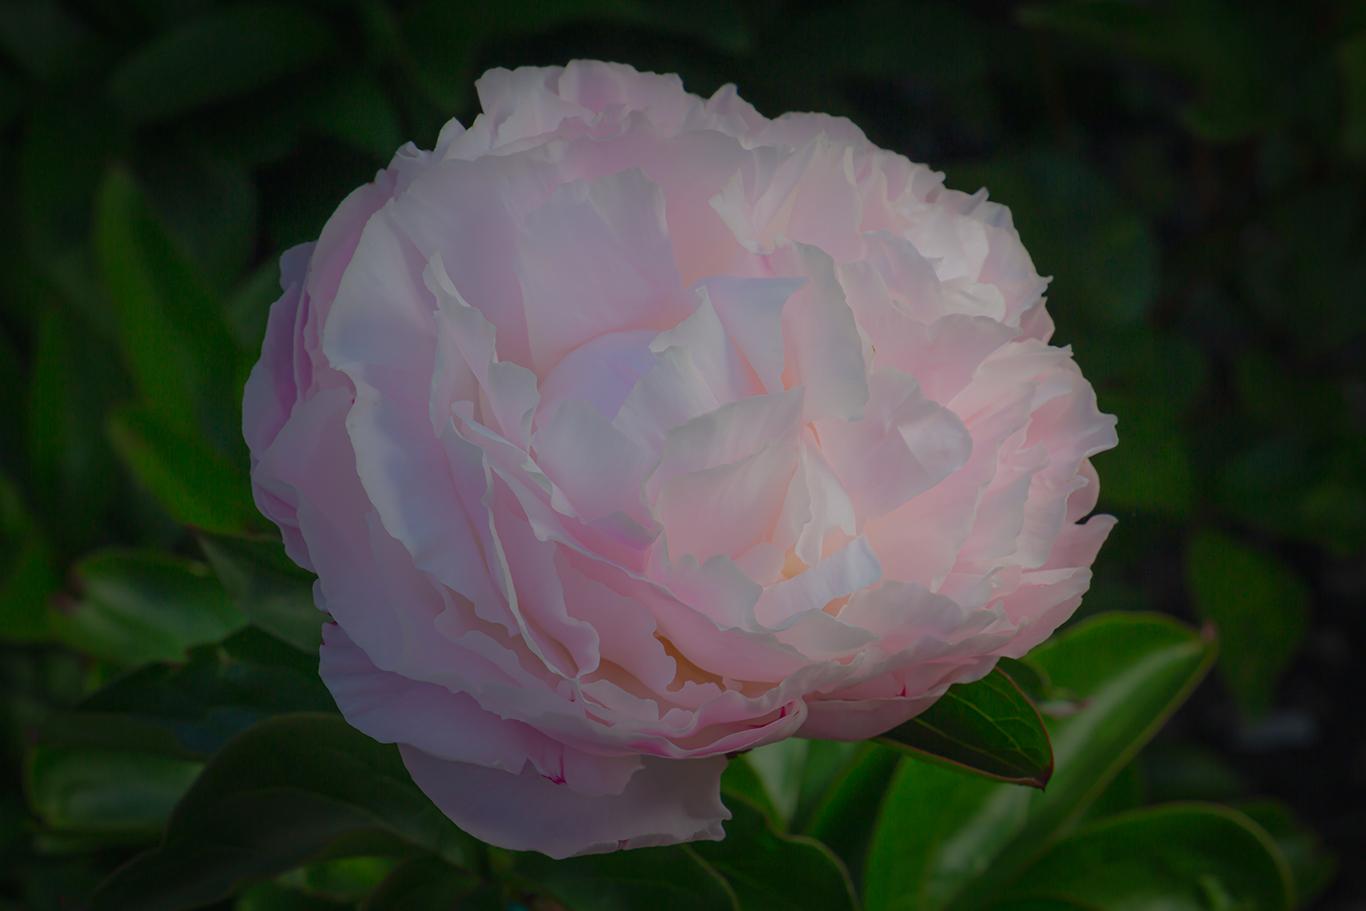 Paeonia lactiflora in bloom